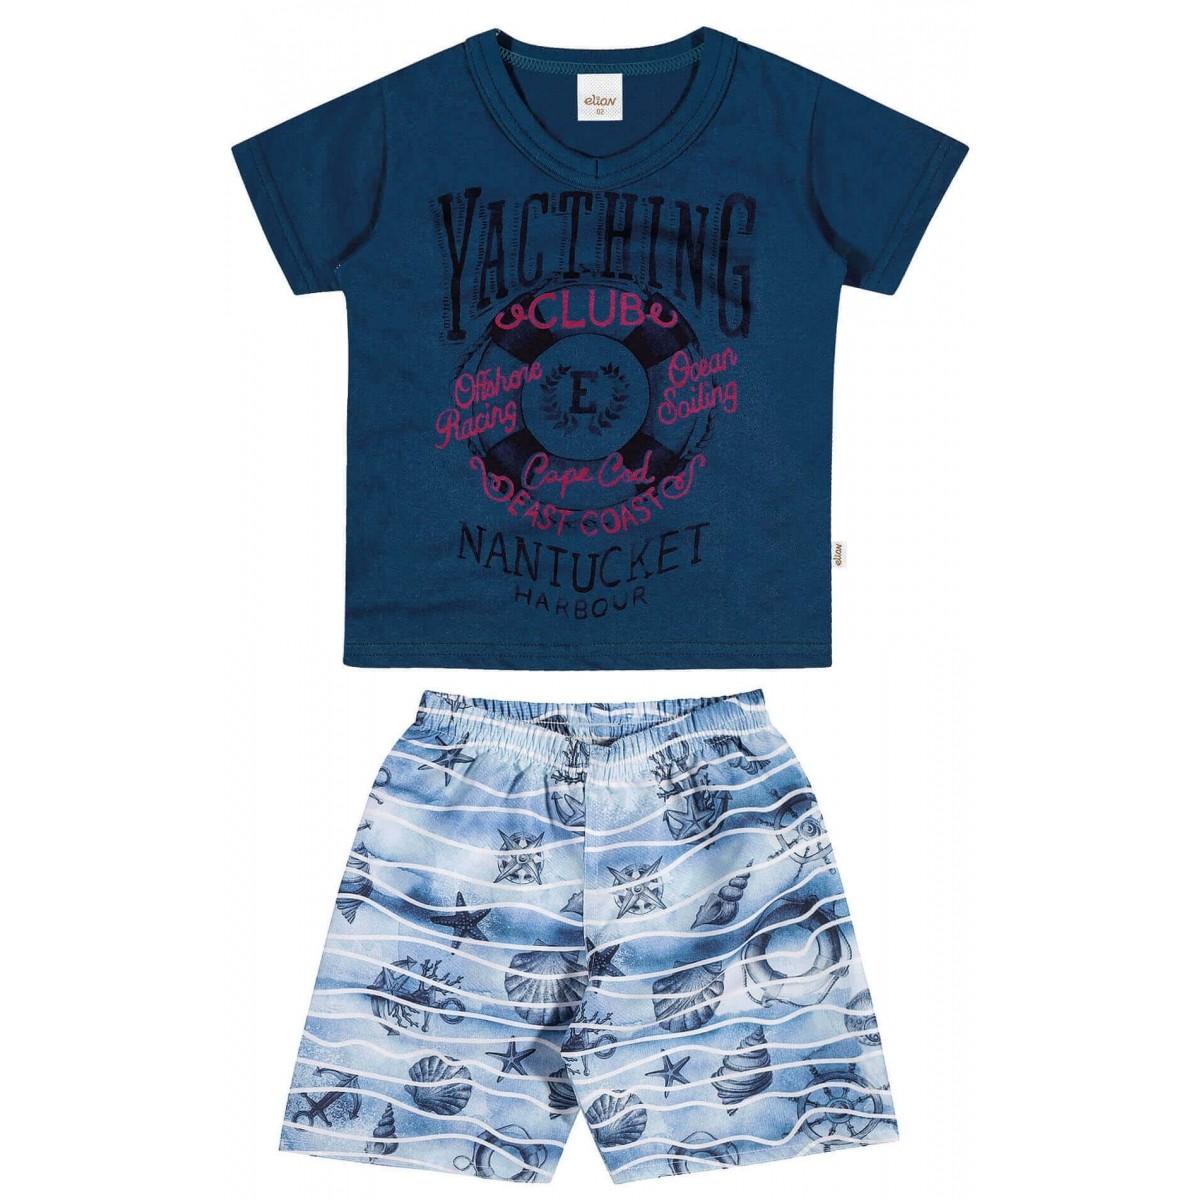 Conjunto Masculino Infantil Azul Marinho Yacthing Elian